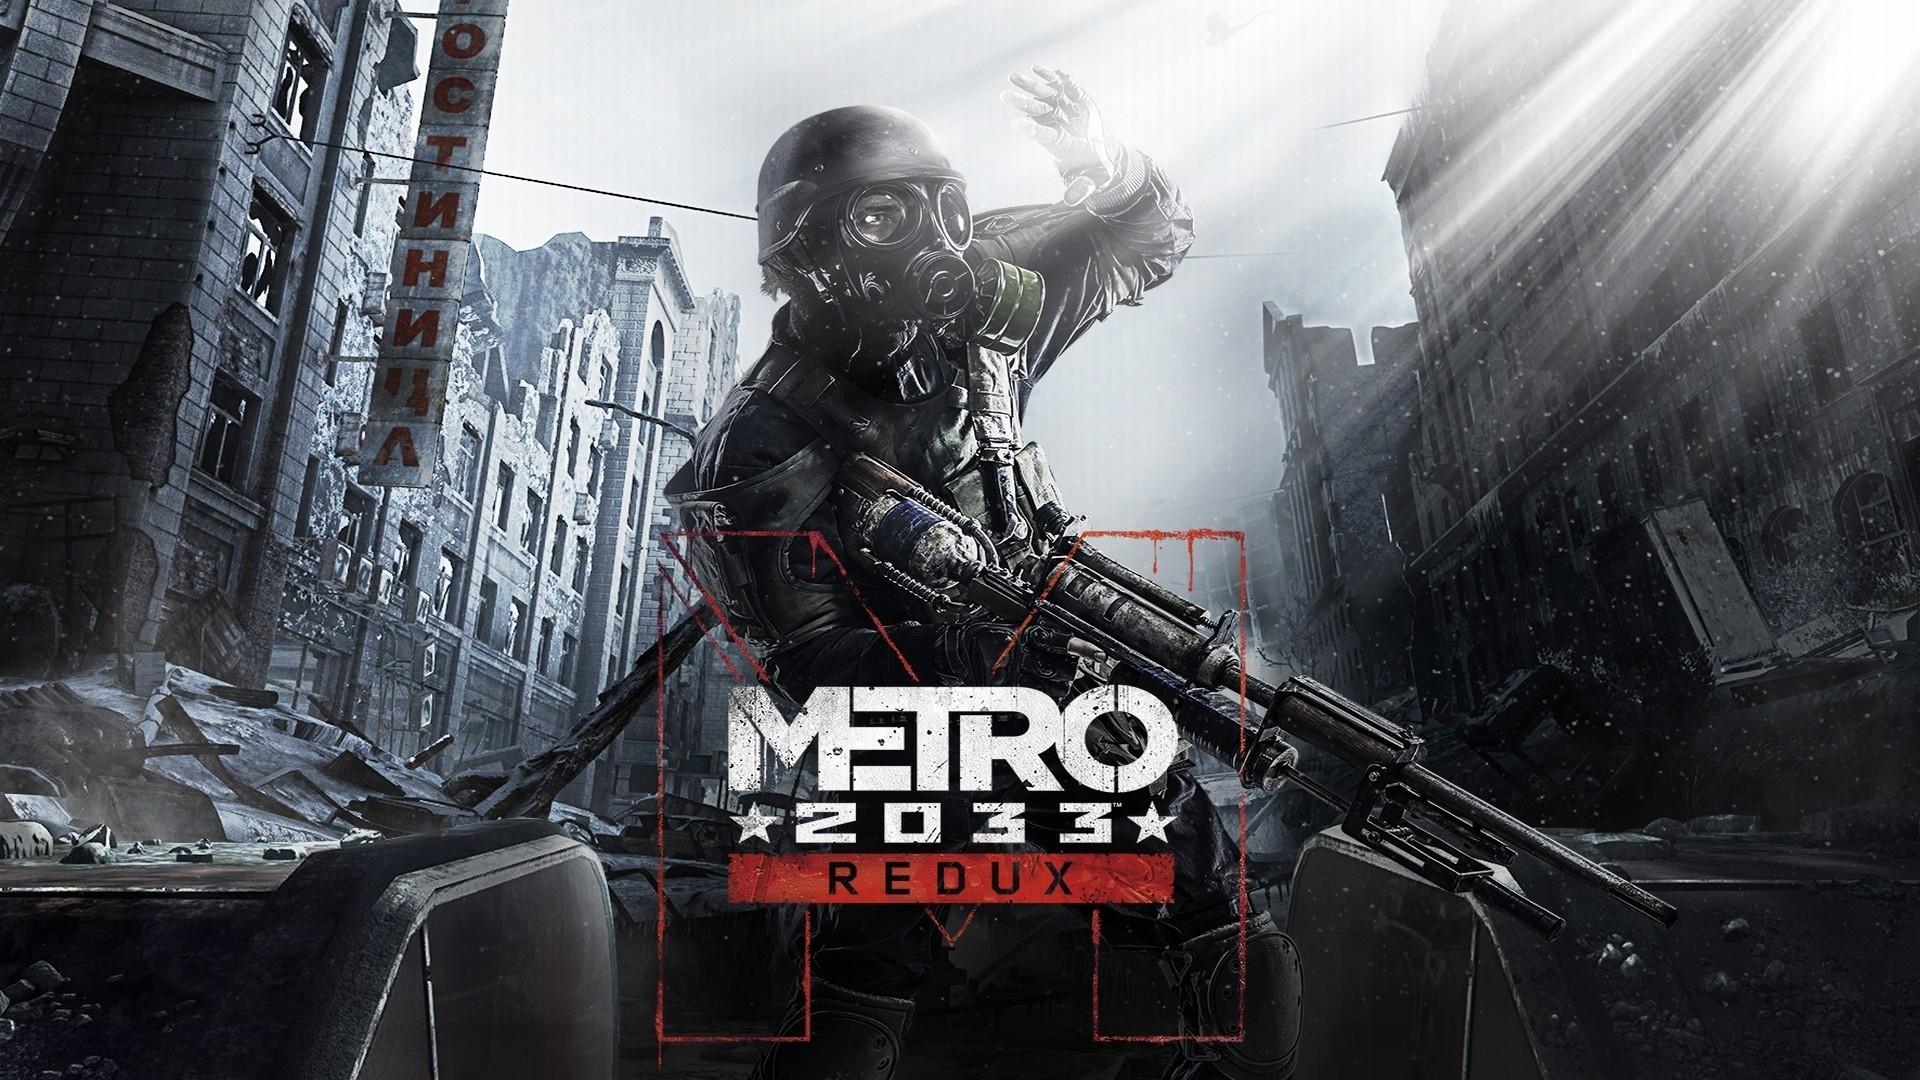 General 1920x1080 Metro 2033 Metro 2033 Redux video games PC gaming apocalyptic video game art 4A Games